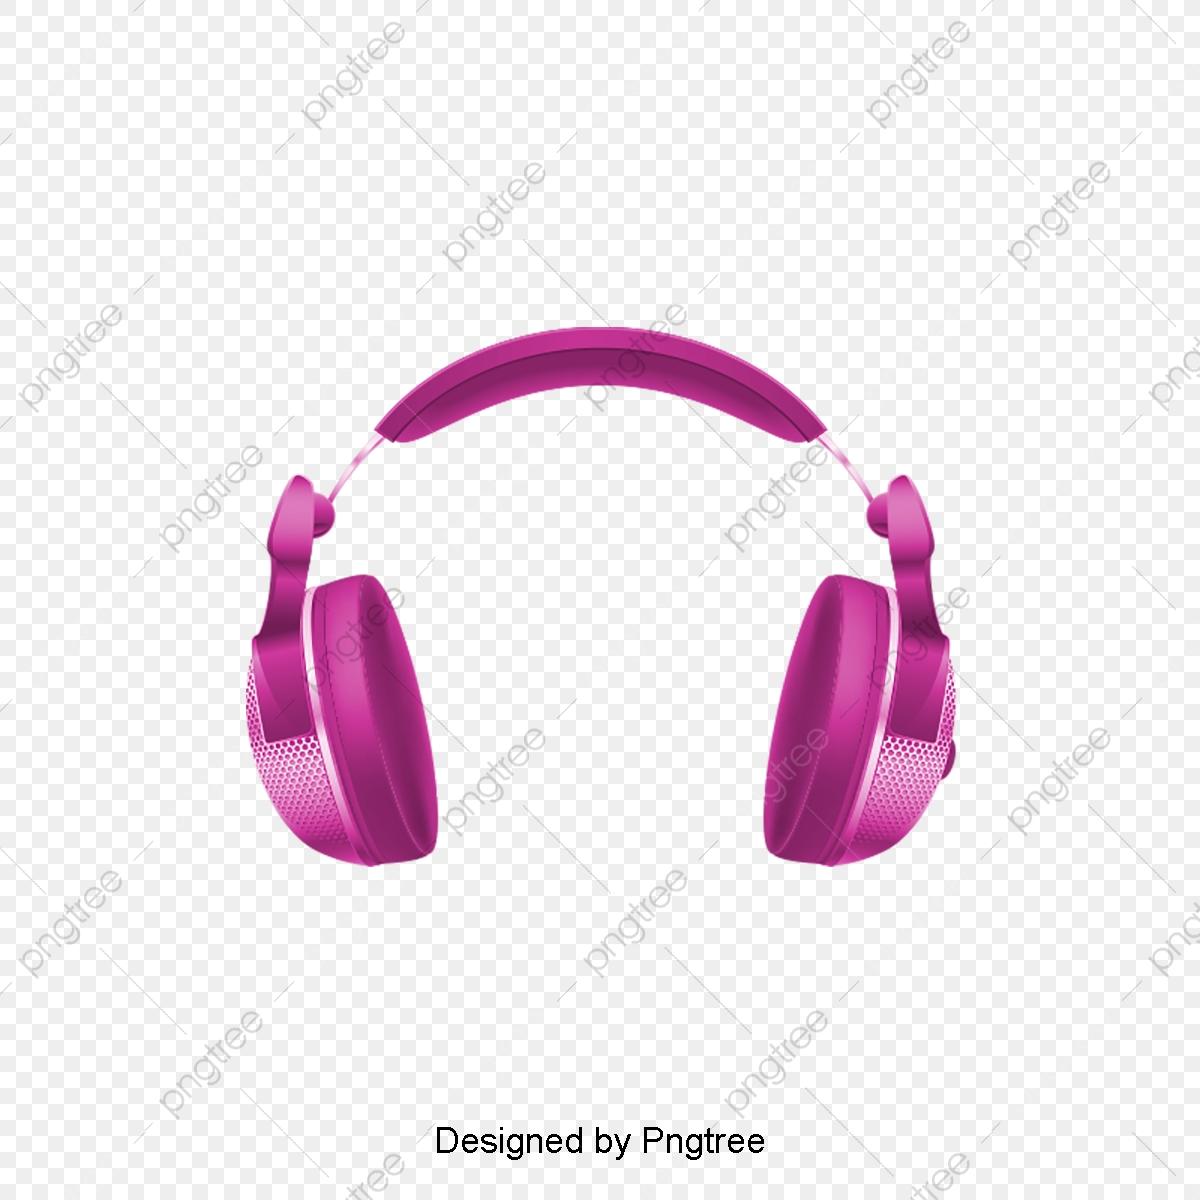 Earmuffs png transparent . Headphones clipart red headphone